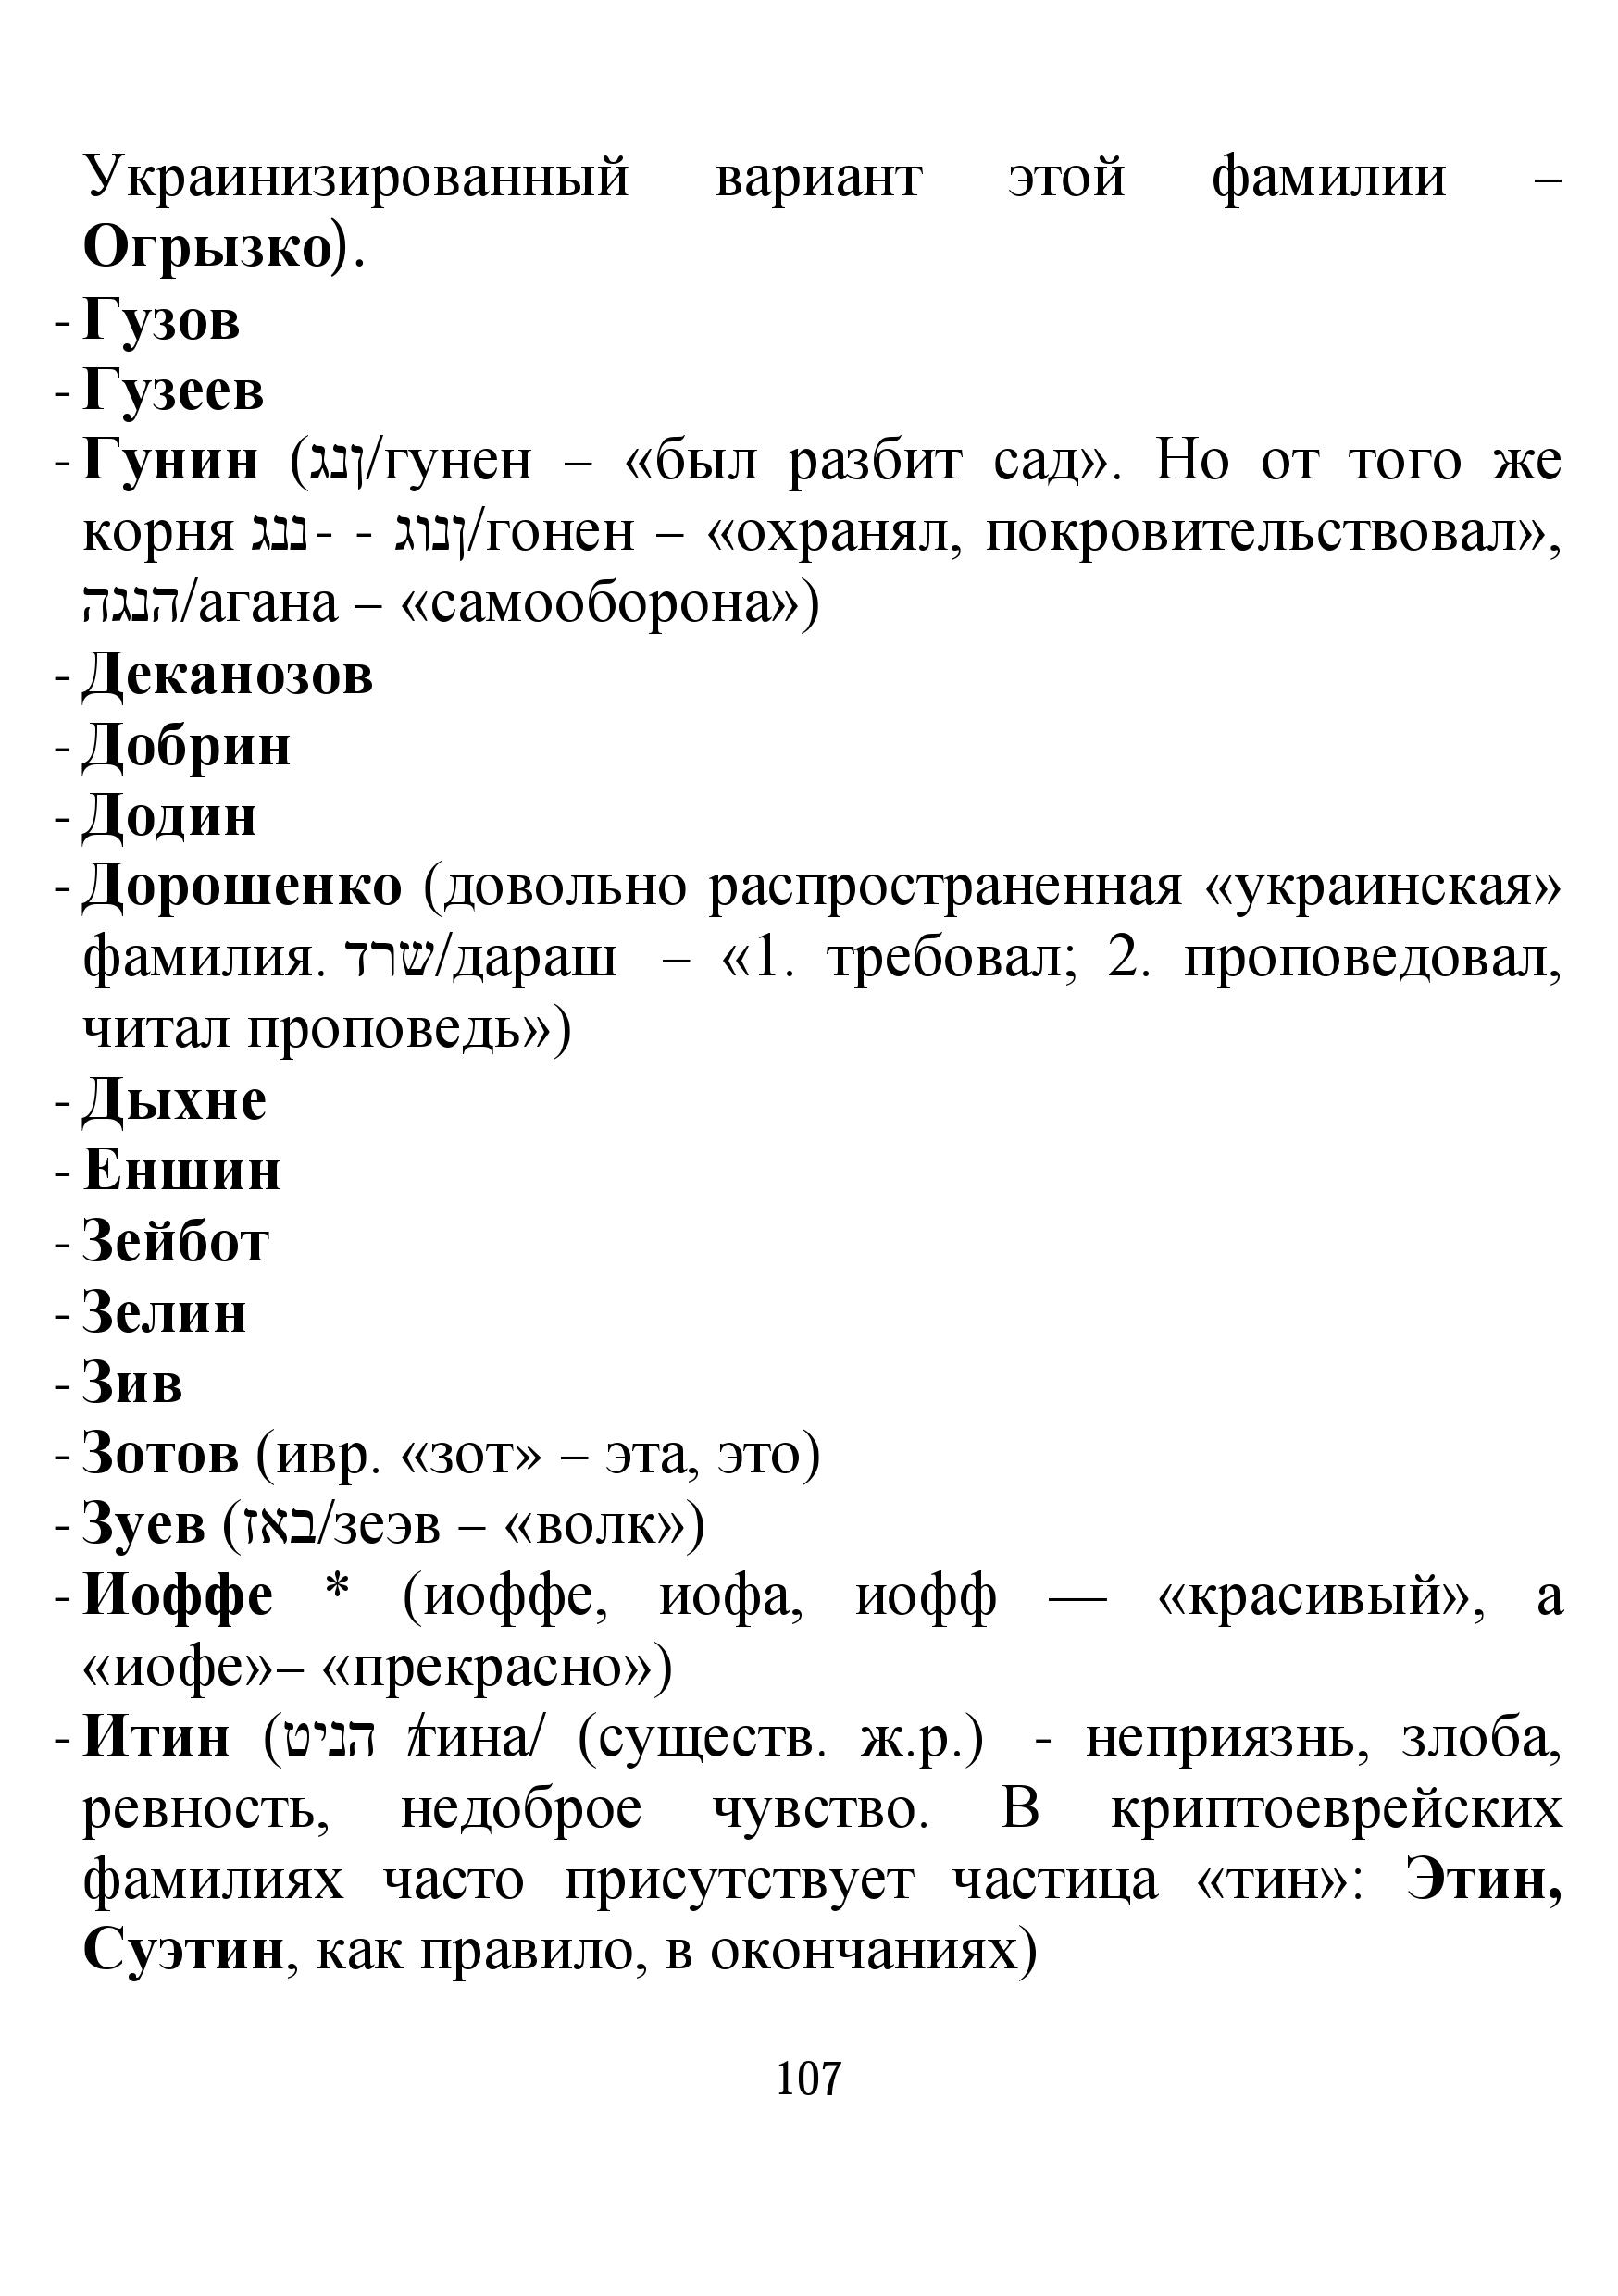 http://s2.uploads.ru/lFV1L.jpg